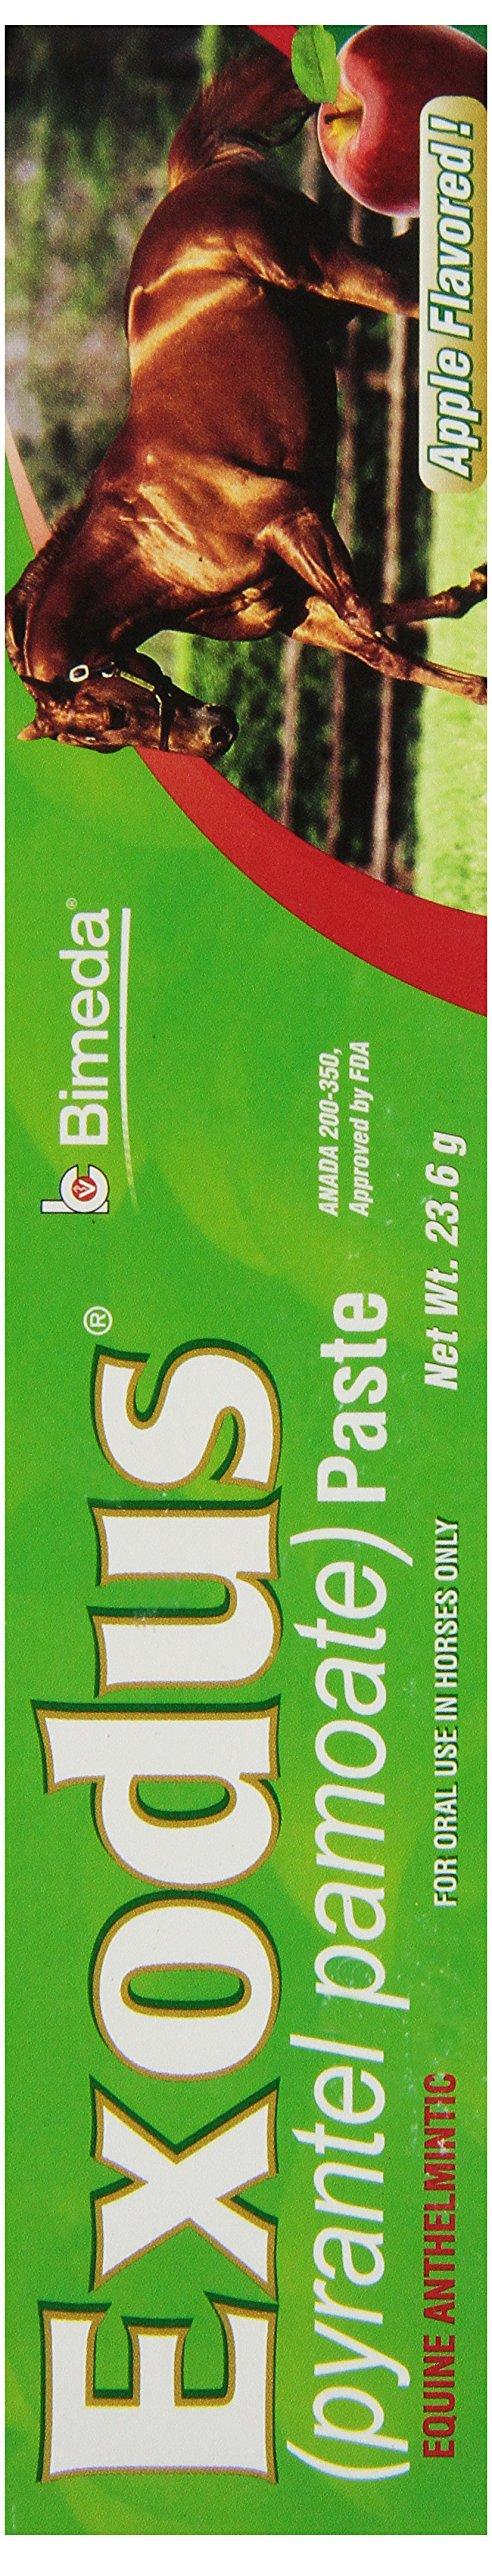 IVESCO 6850007 Exodus Equine Deworm Paste for Horses, 23.6gm